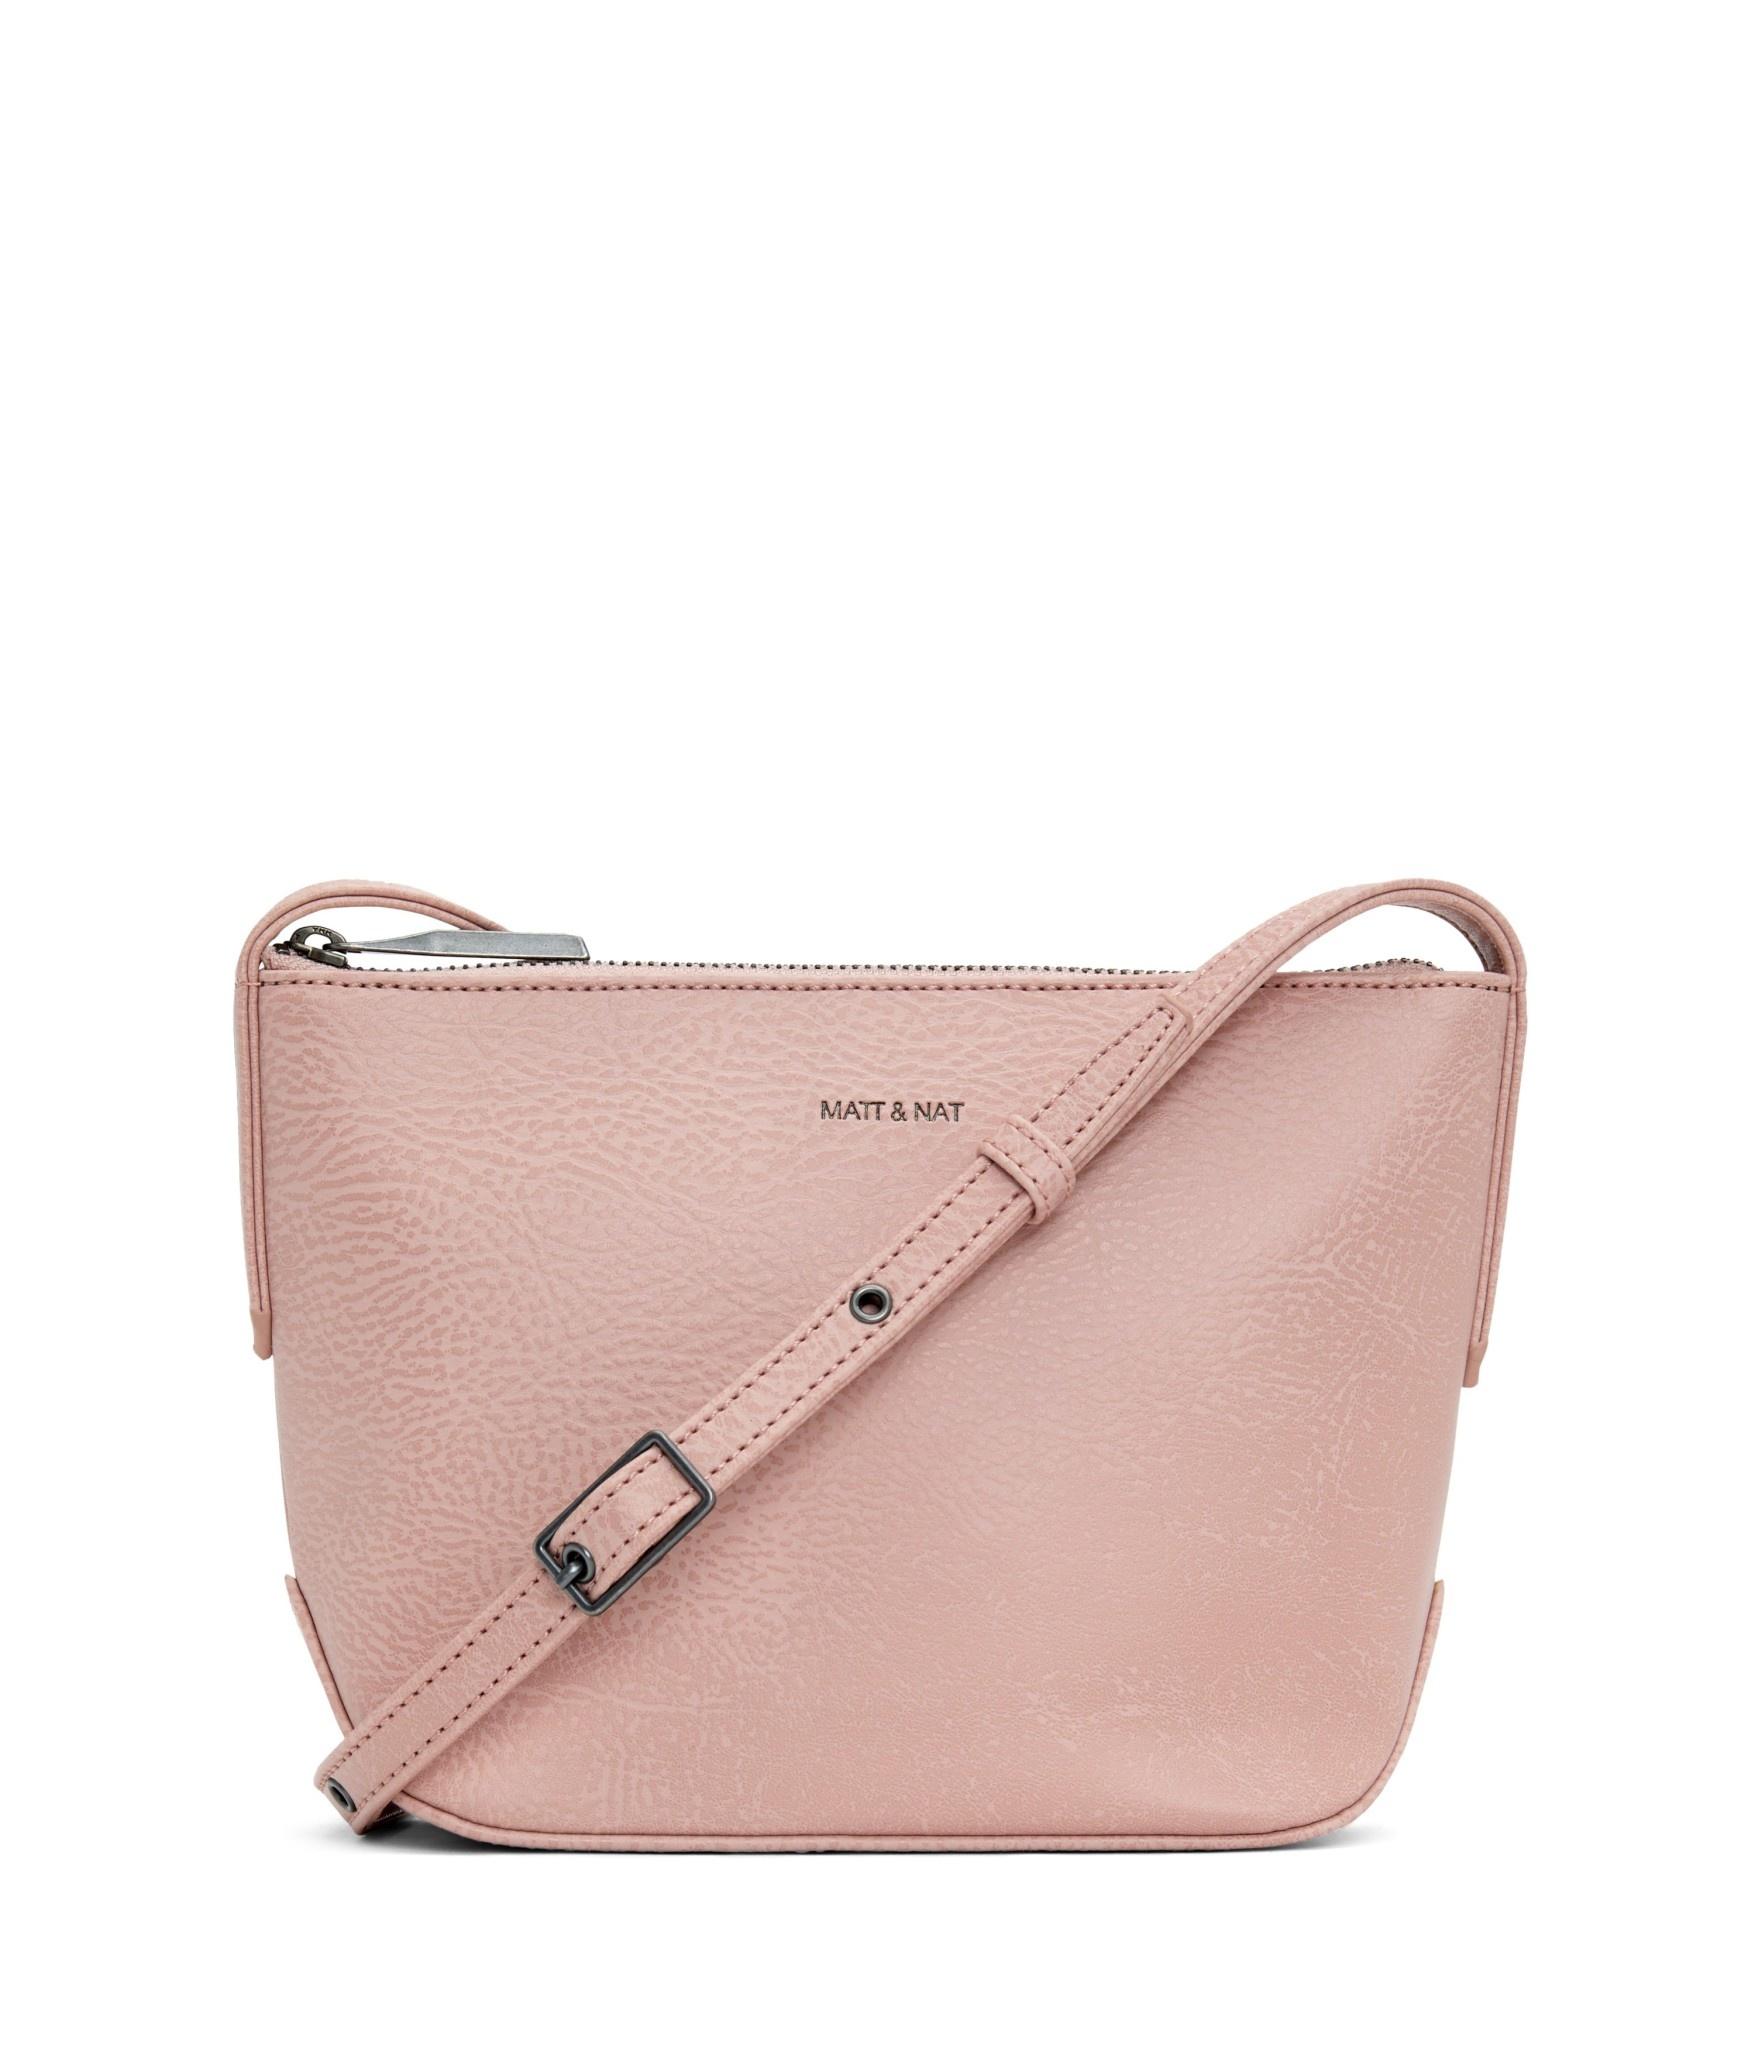 Sam Crossbody Bag Pebble Pink-5